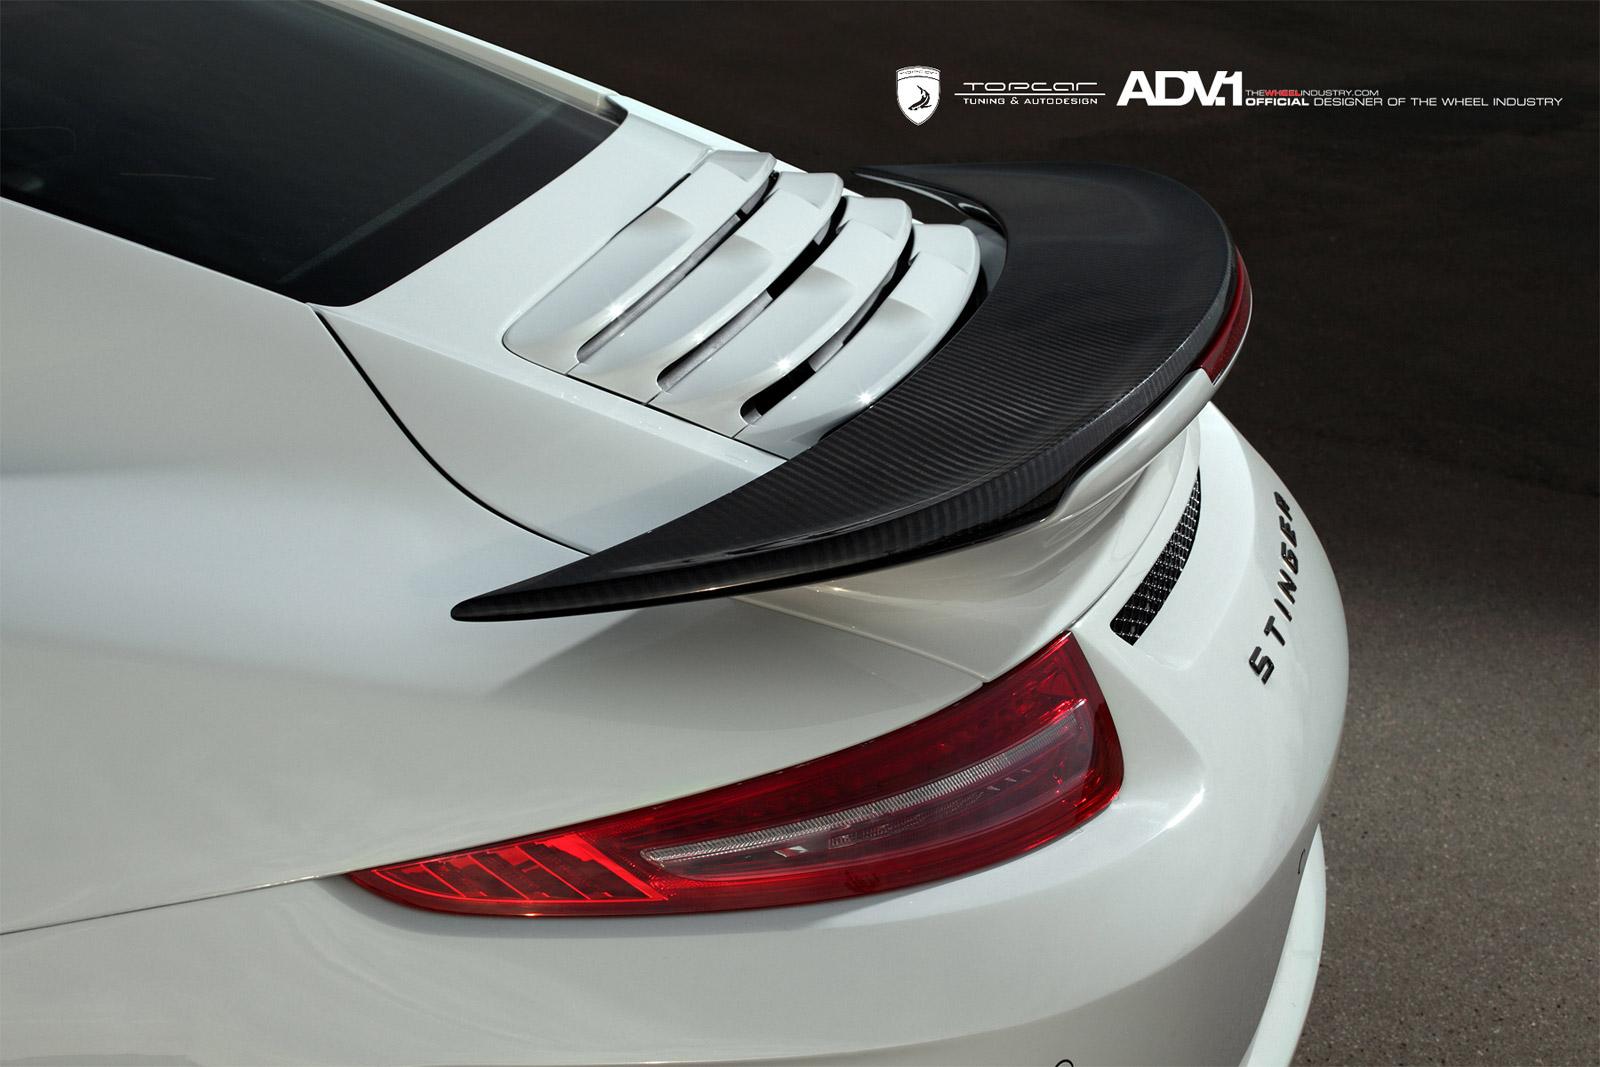 porsche-911-turbo-typ-991-topcar-stinger-gtr-001